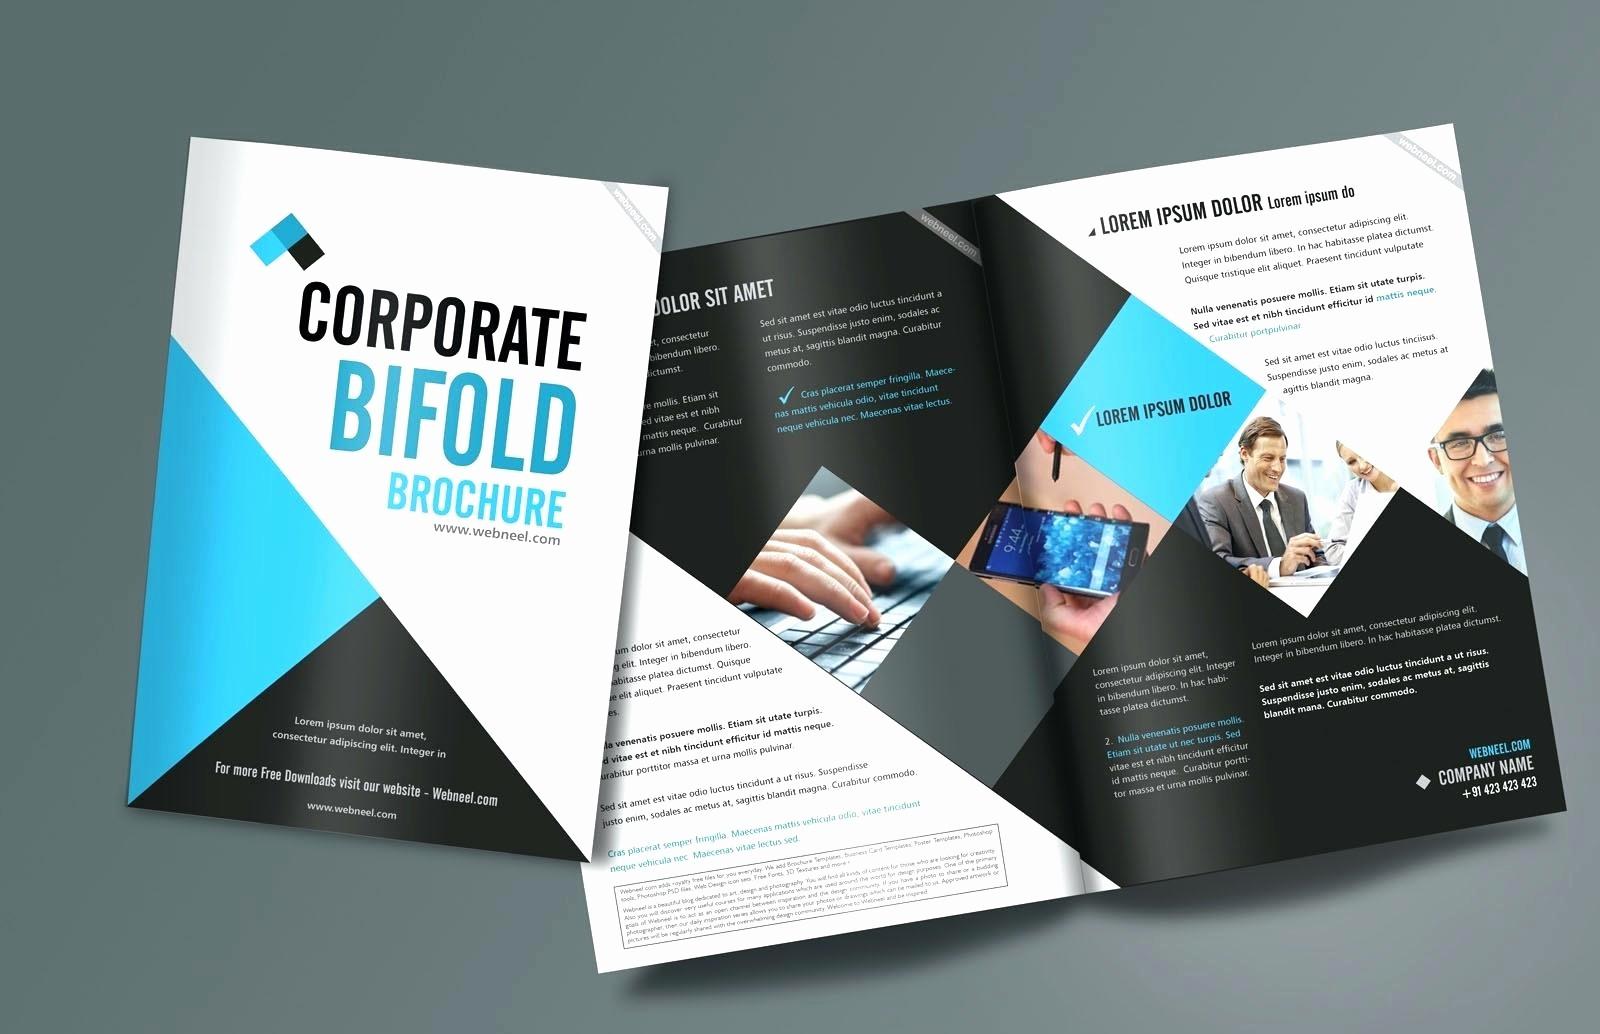 Bi Fold Brochure Templates Free New 3 Fold Brochure Template Indesign